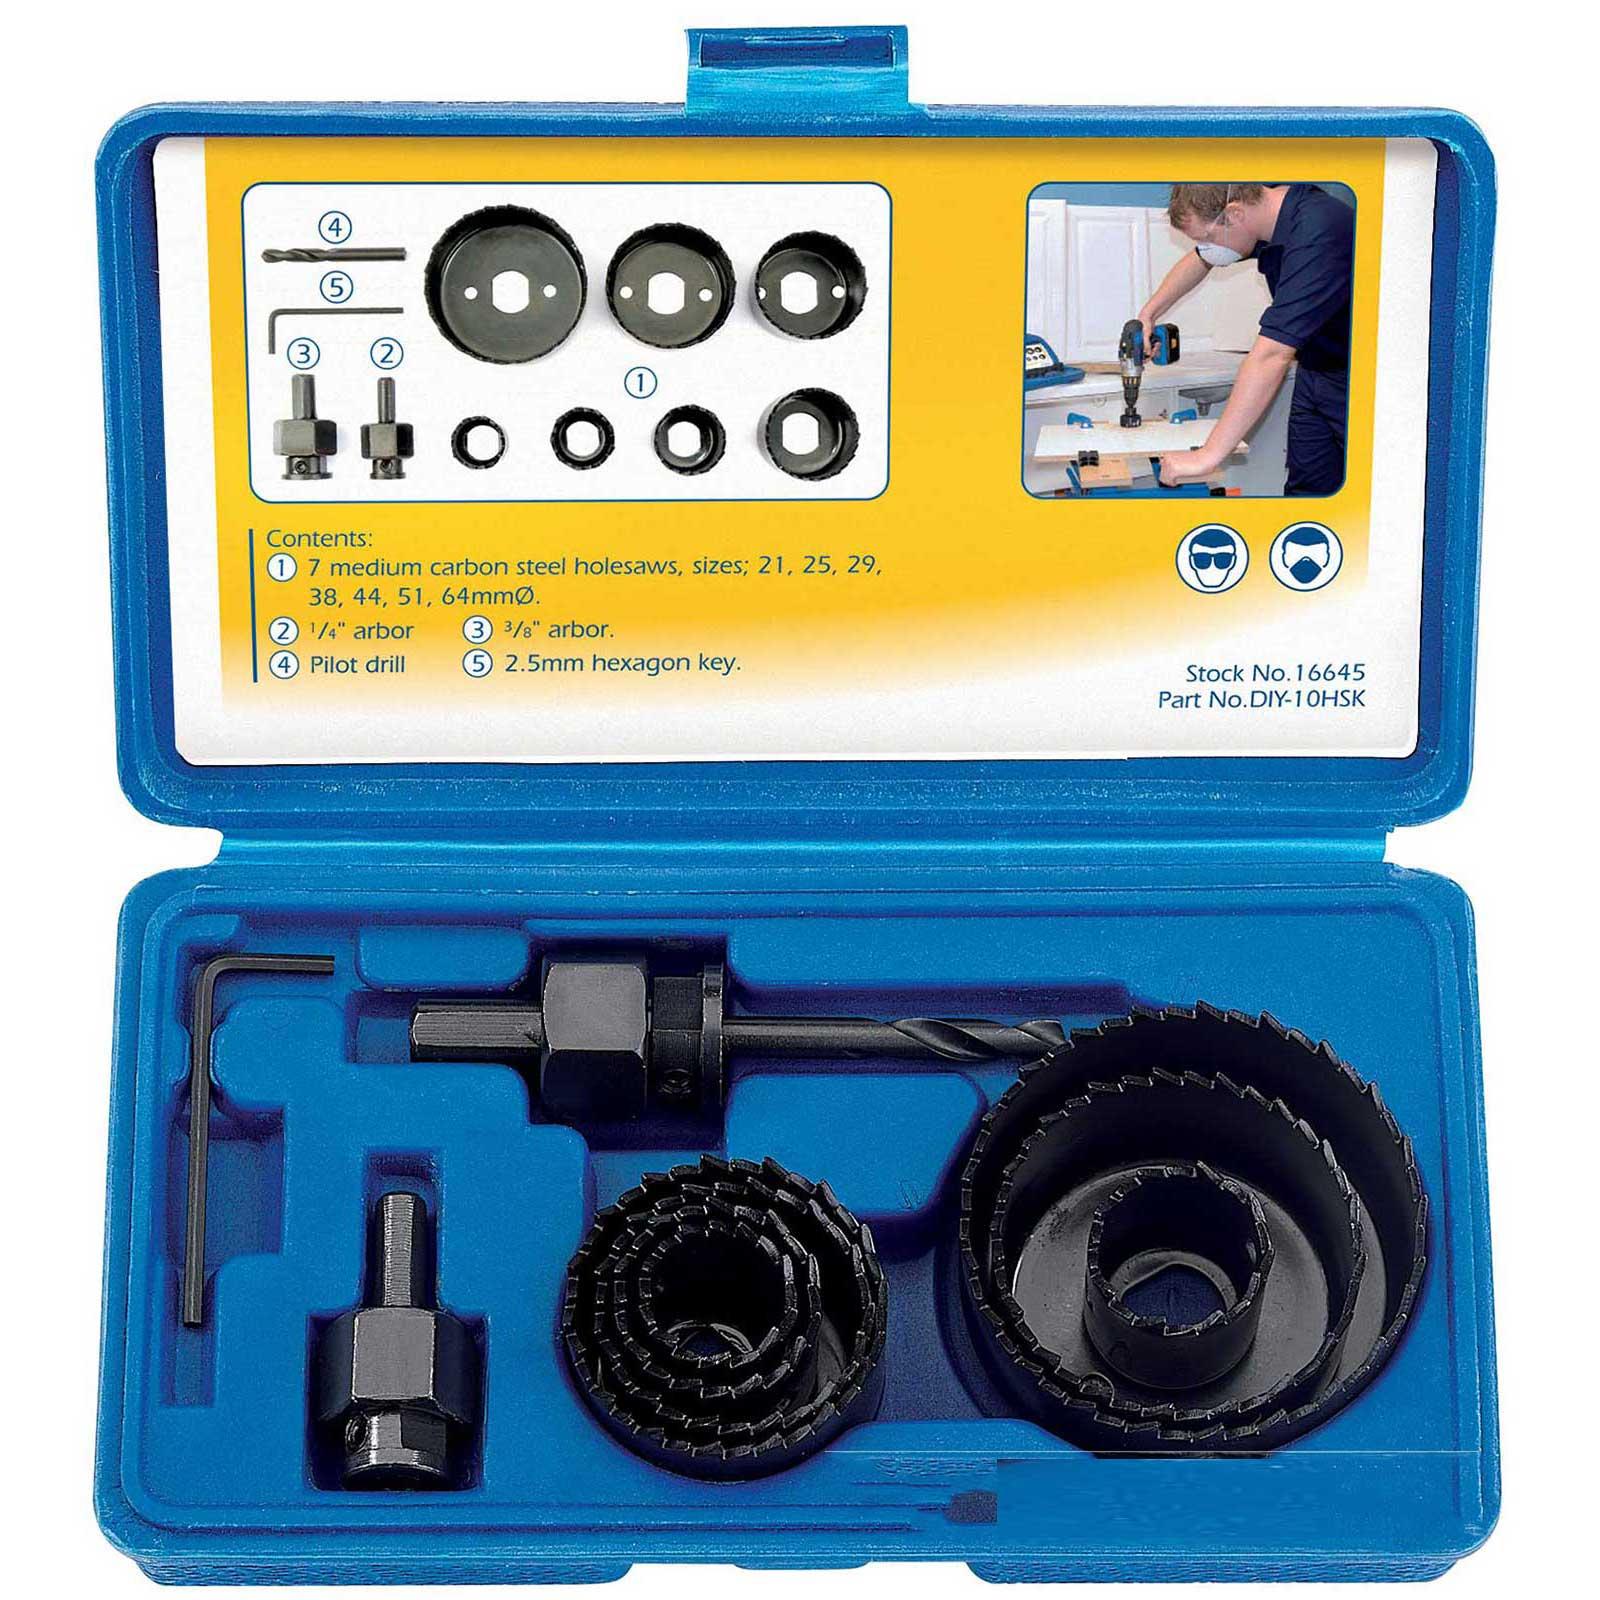 hole saw bit sizes. draper holesaw kit hole drill cutter set plumber kitchen fitter for cutting wood saw bit sizes